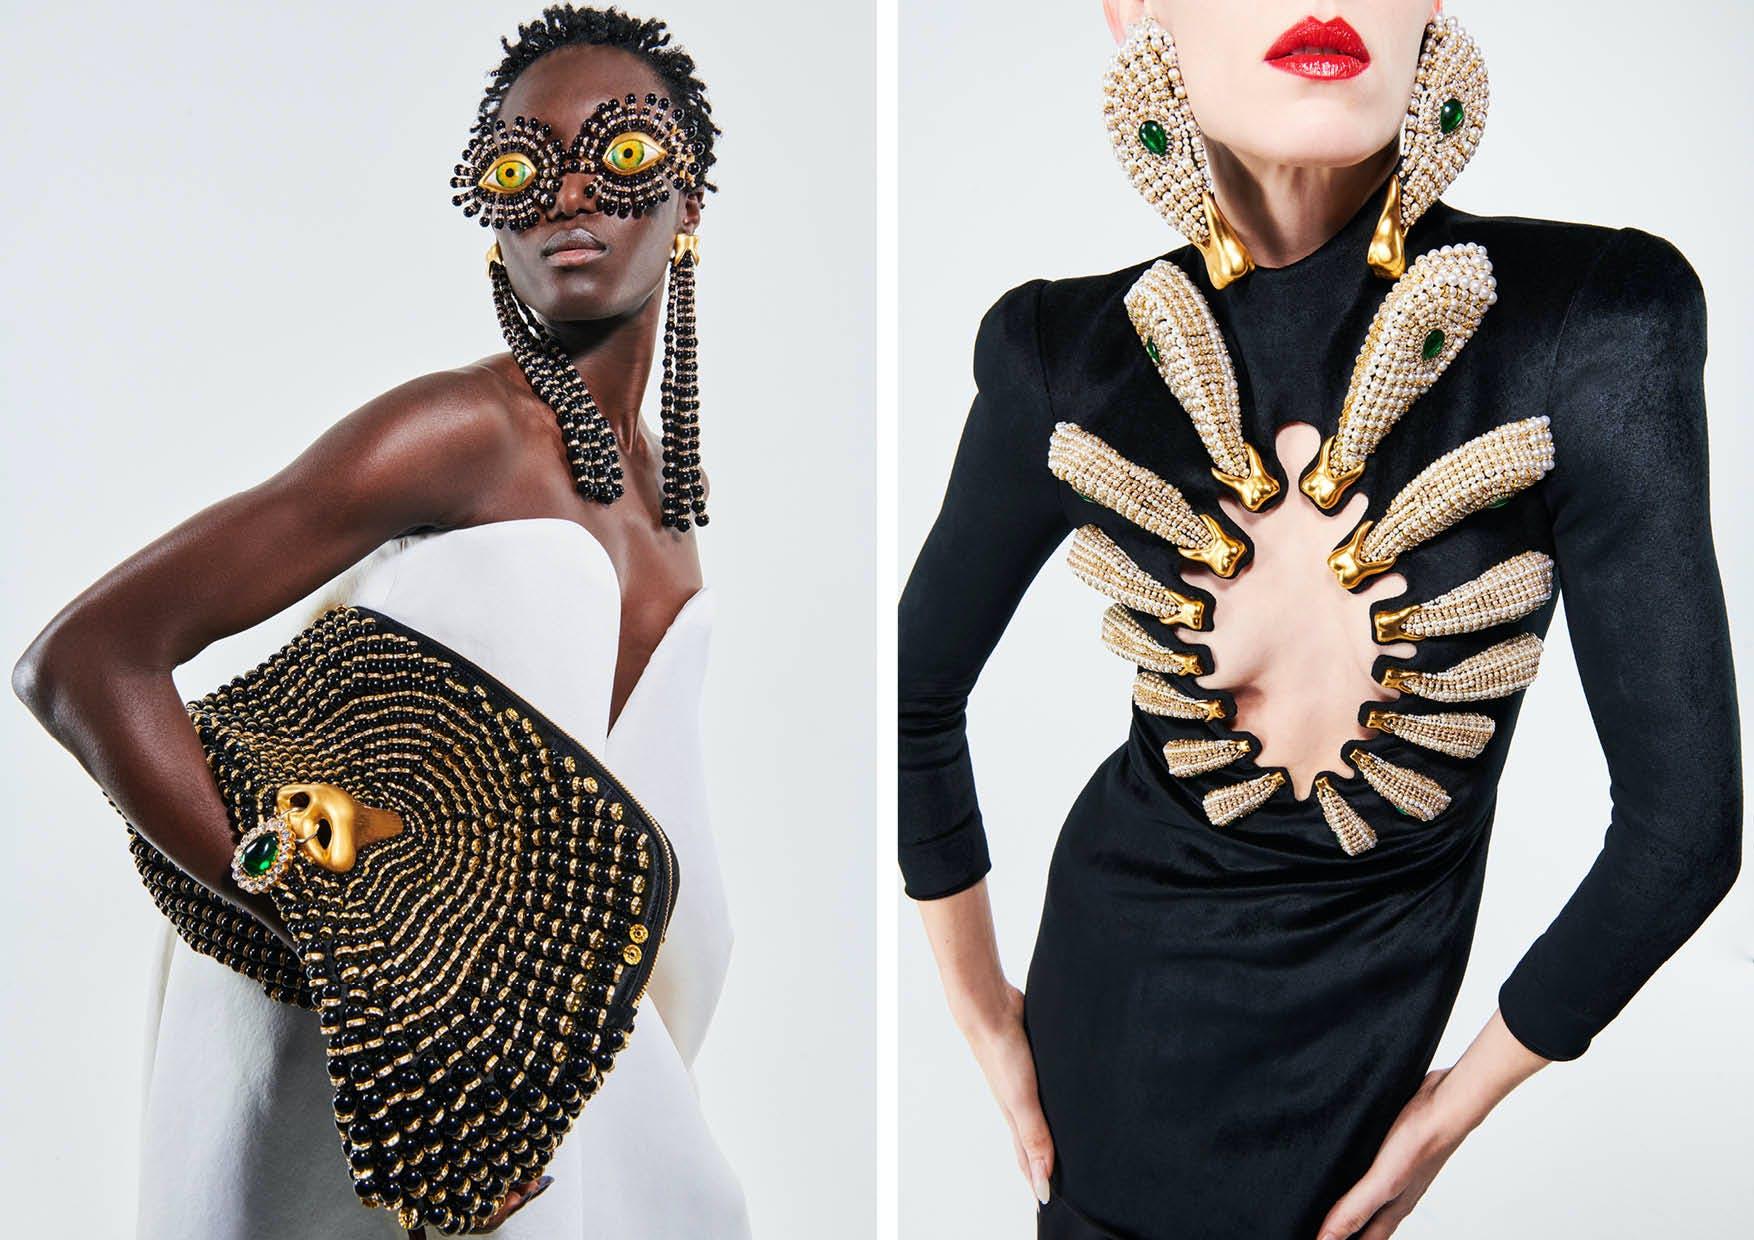 Schiaparelli Spring/Summer 2021 Haute Couture - The Magic of Schiaparelli  Enhances the Bod